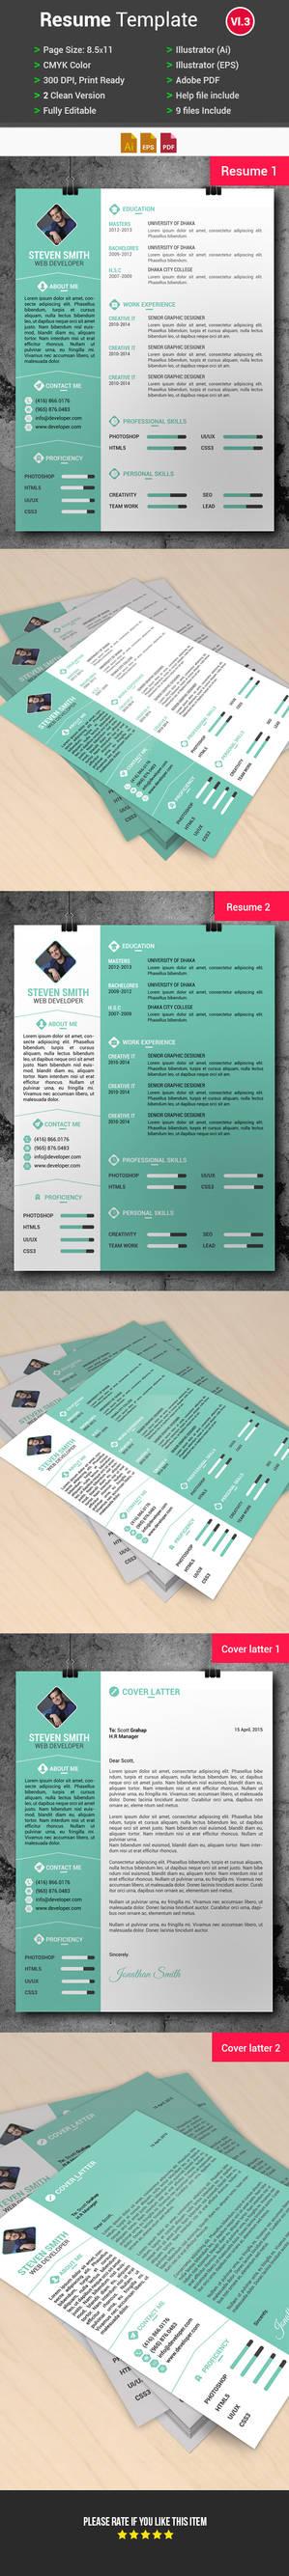 Resume/CV Template (Free Download)